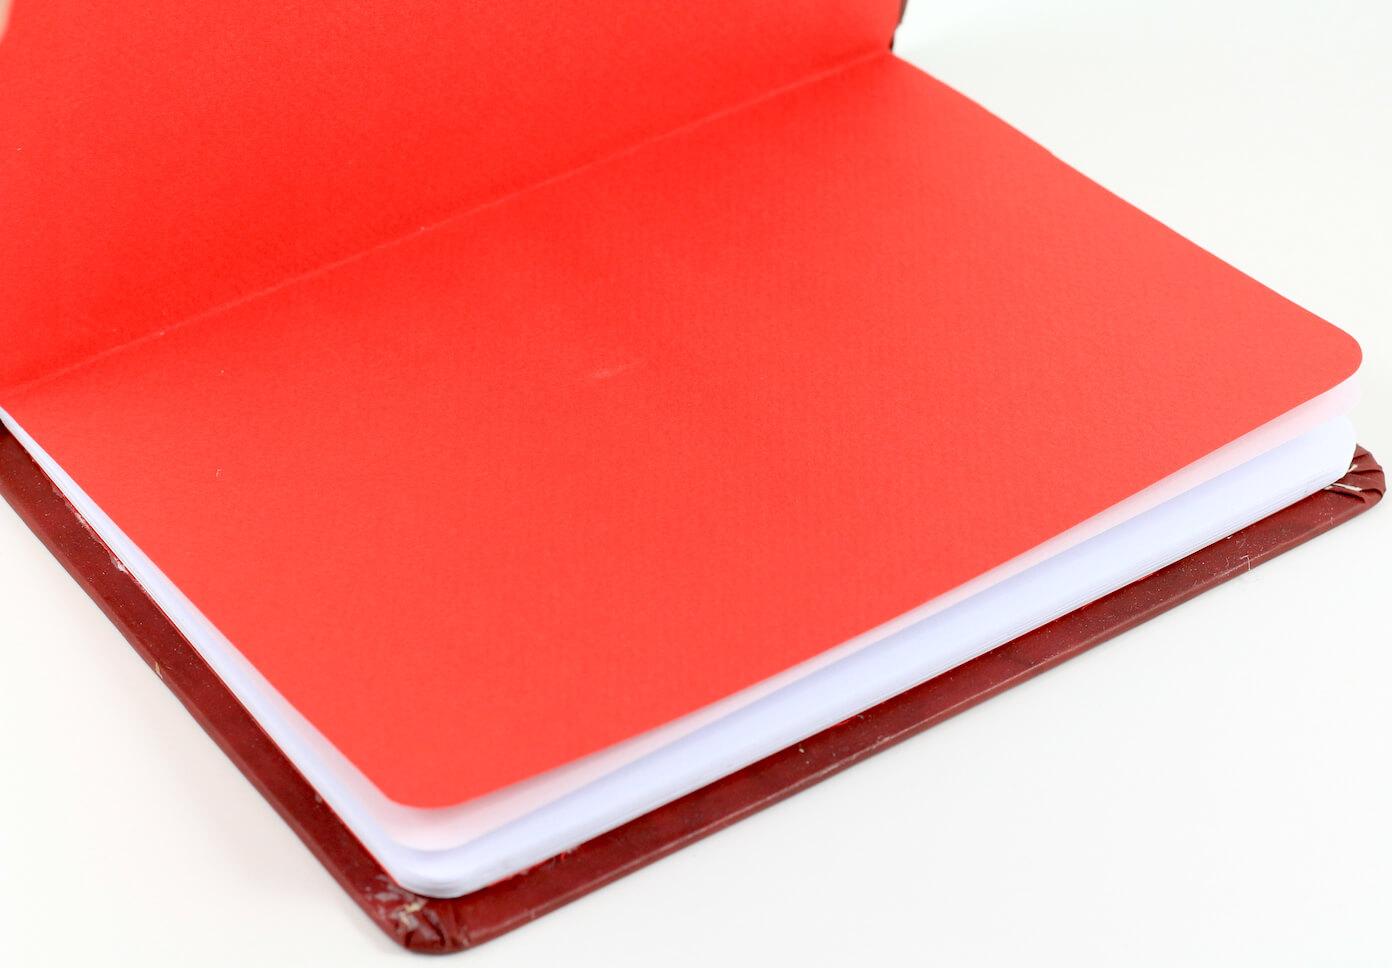 El Yapımı Kedili Defter (Kırmızı – Büyük)